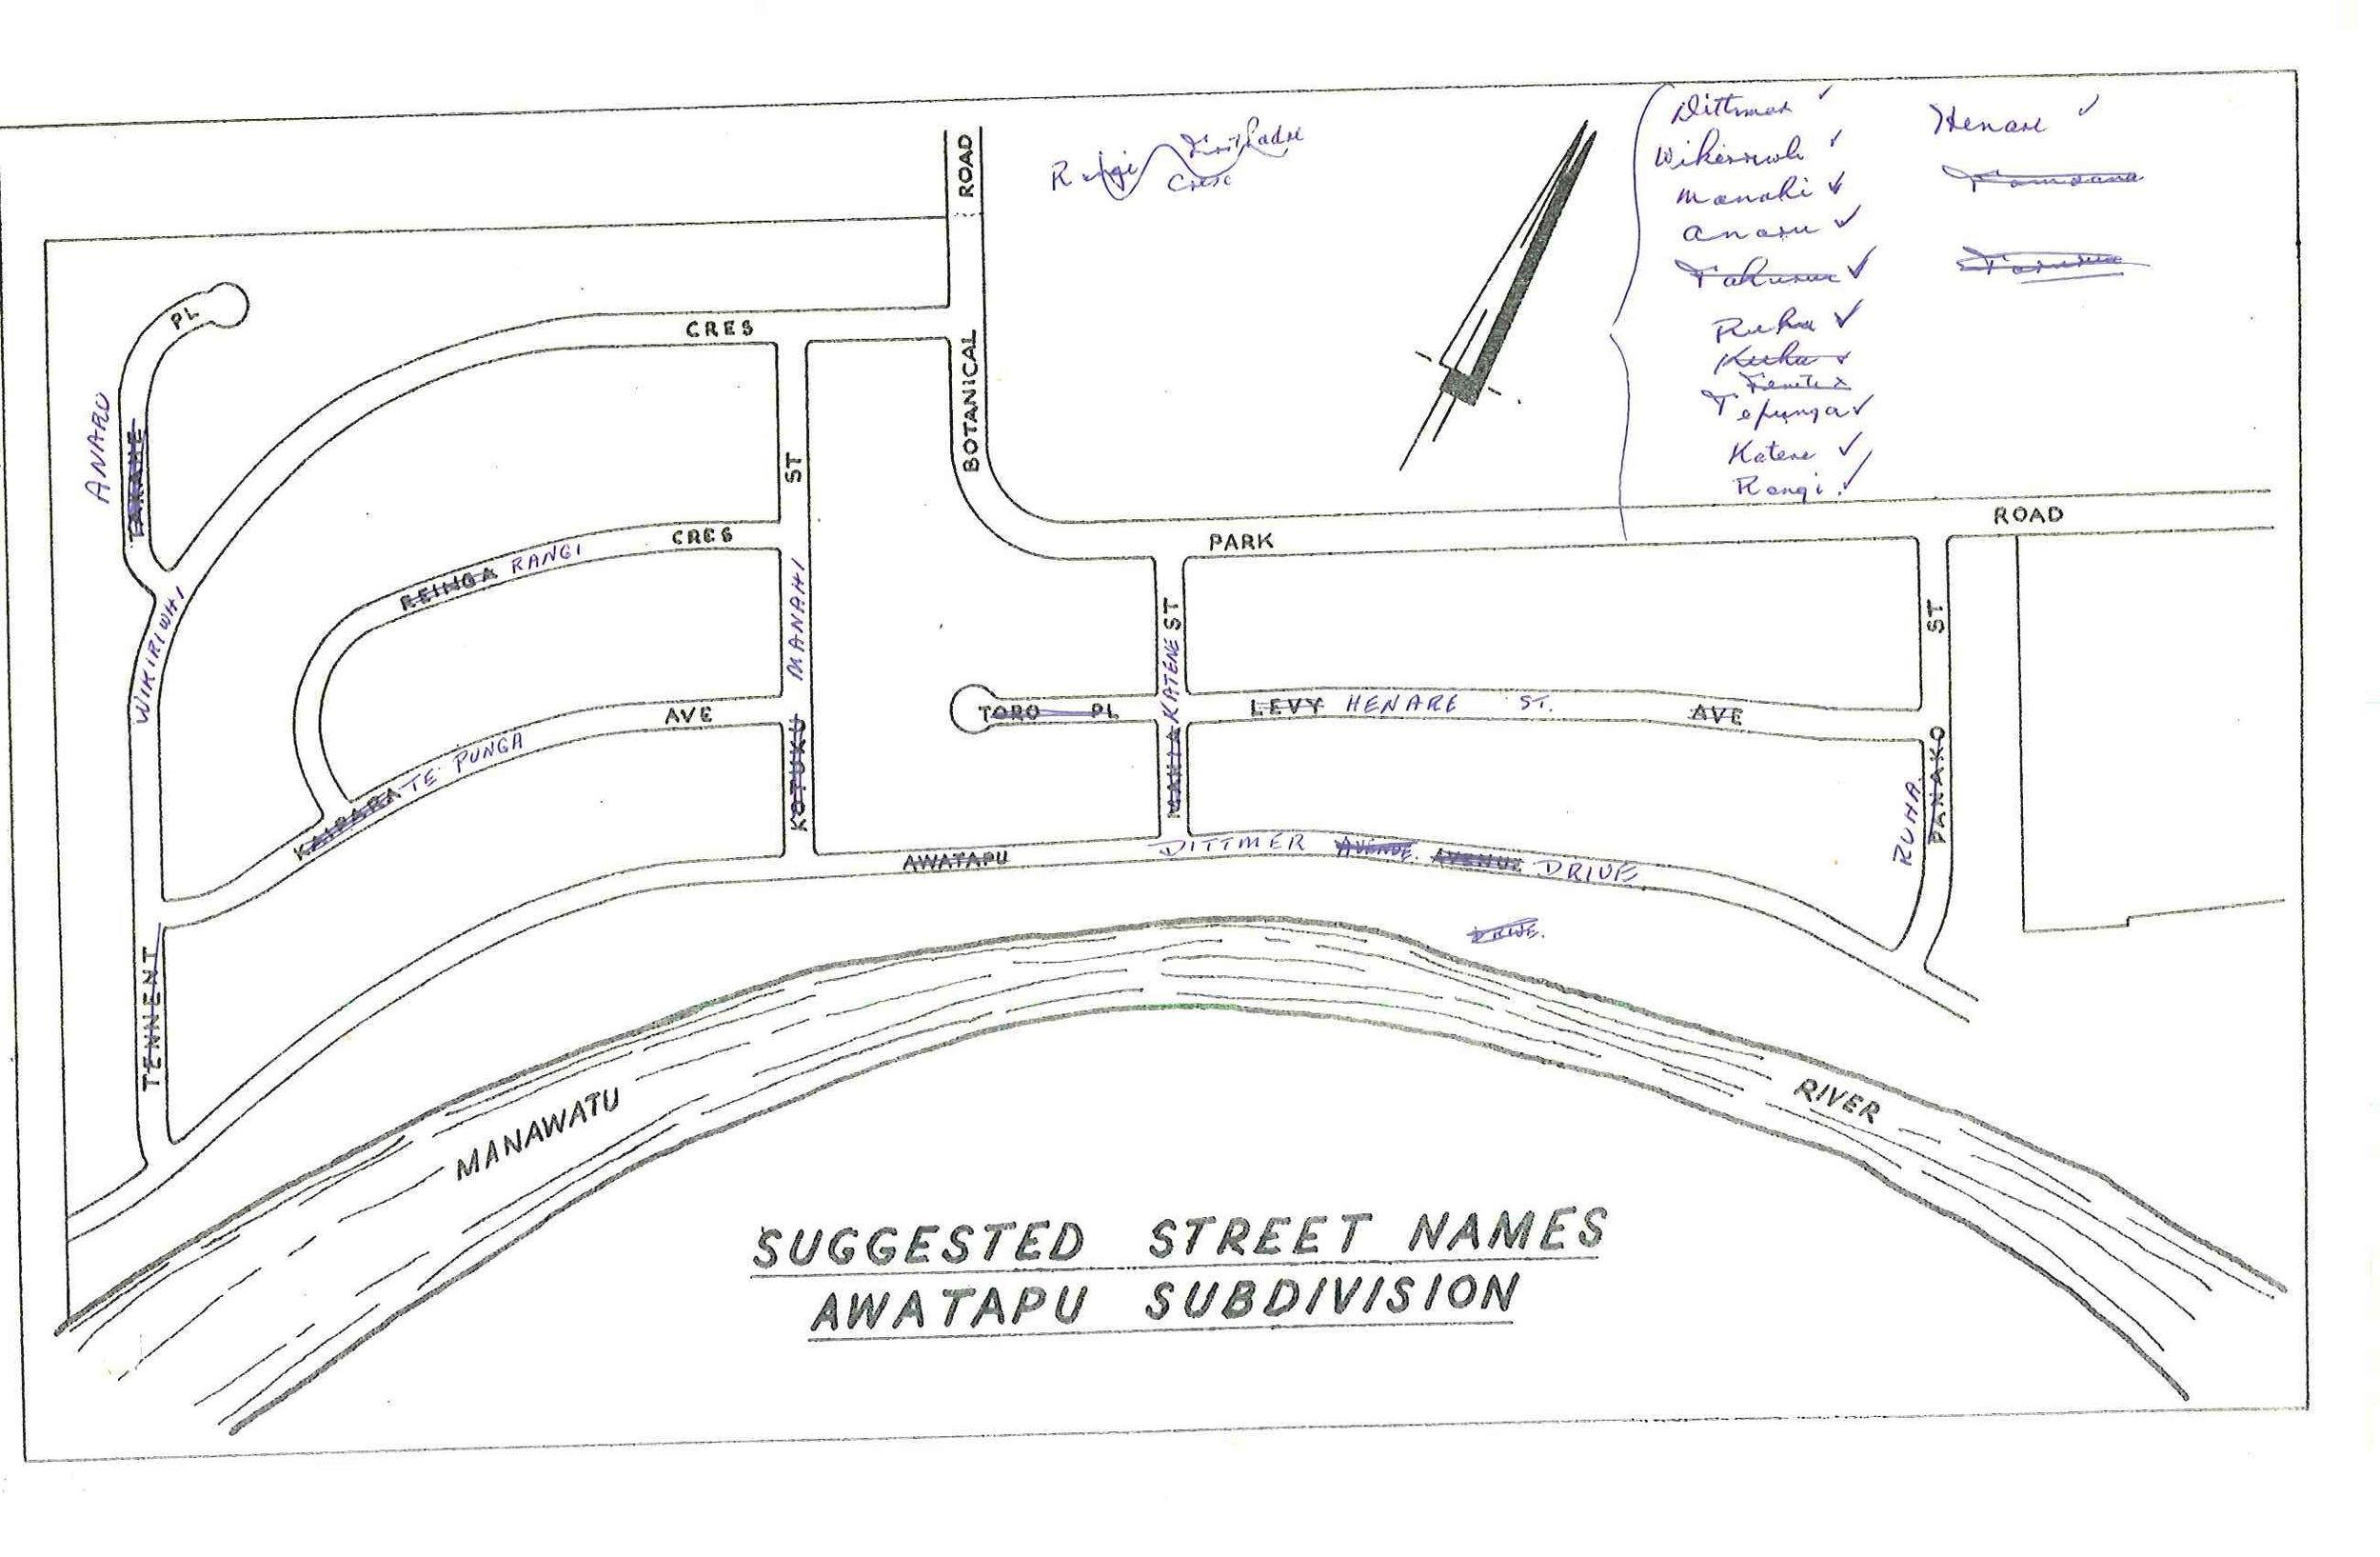 Figure 2: Original street name plan showing the renaming of Kaipara Street to Te Punga Avenue (later, Te Punga Place when it was shortened to accommodate Awatapu College). Source: Ian Matheson City Archives, Series 1/5/5, File 75/115, part 1.